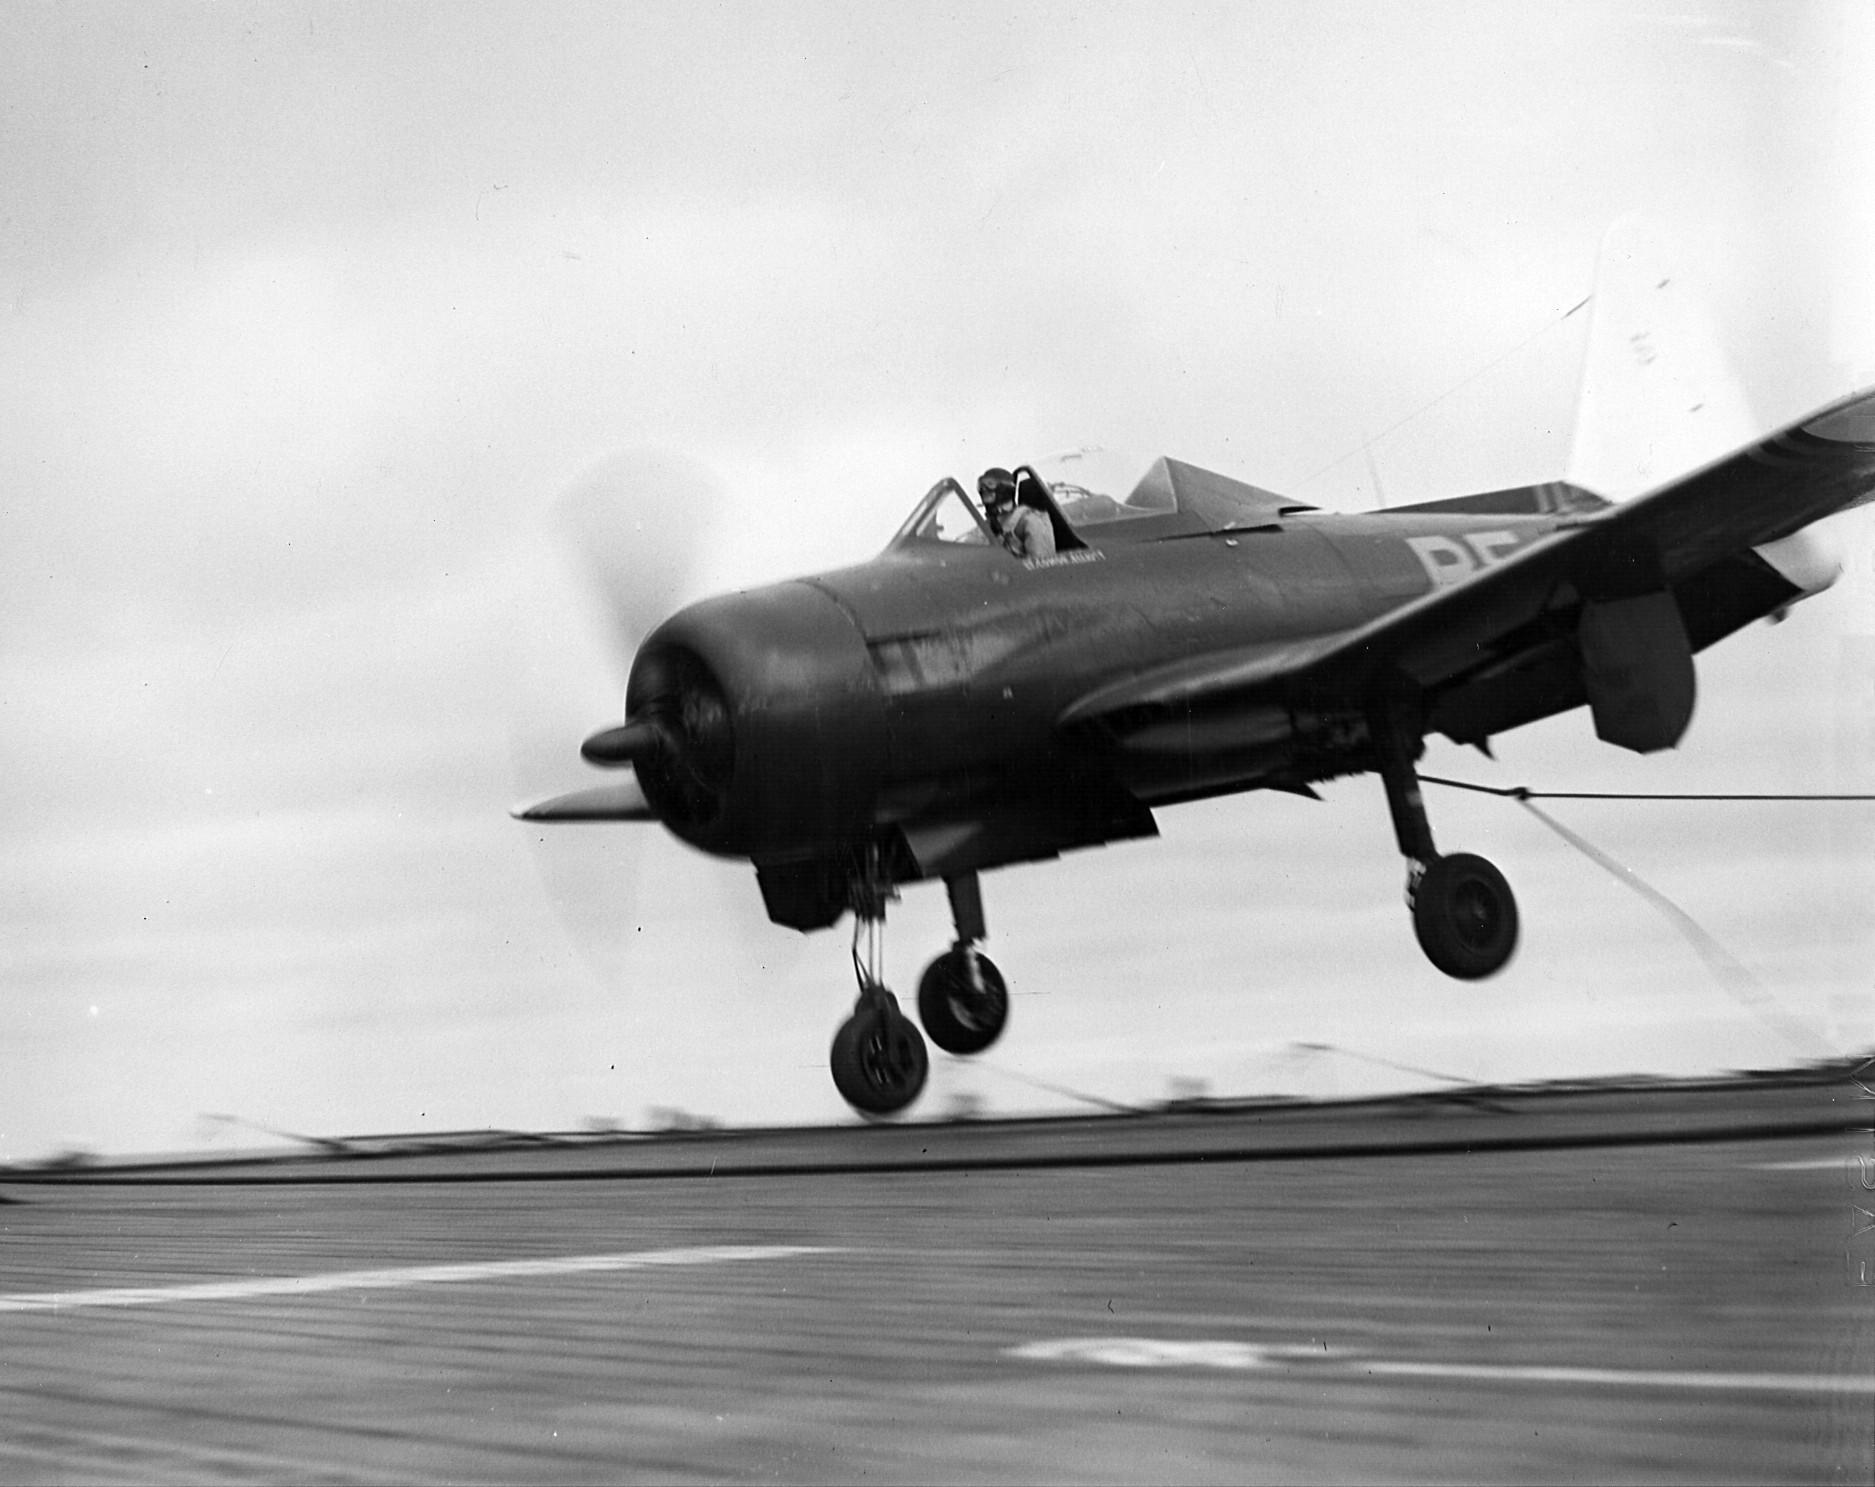 Ryan_FR-1_landing_on_USS_Bairoko_1946.jp